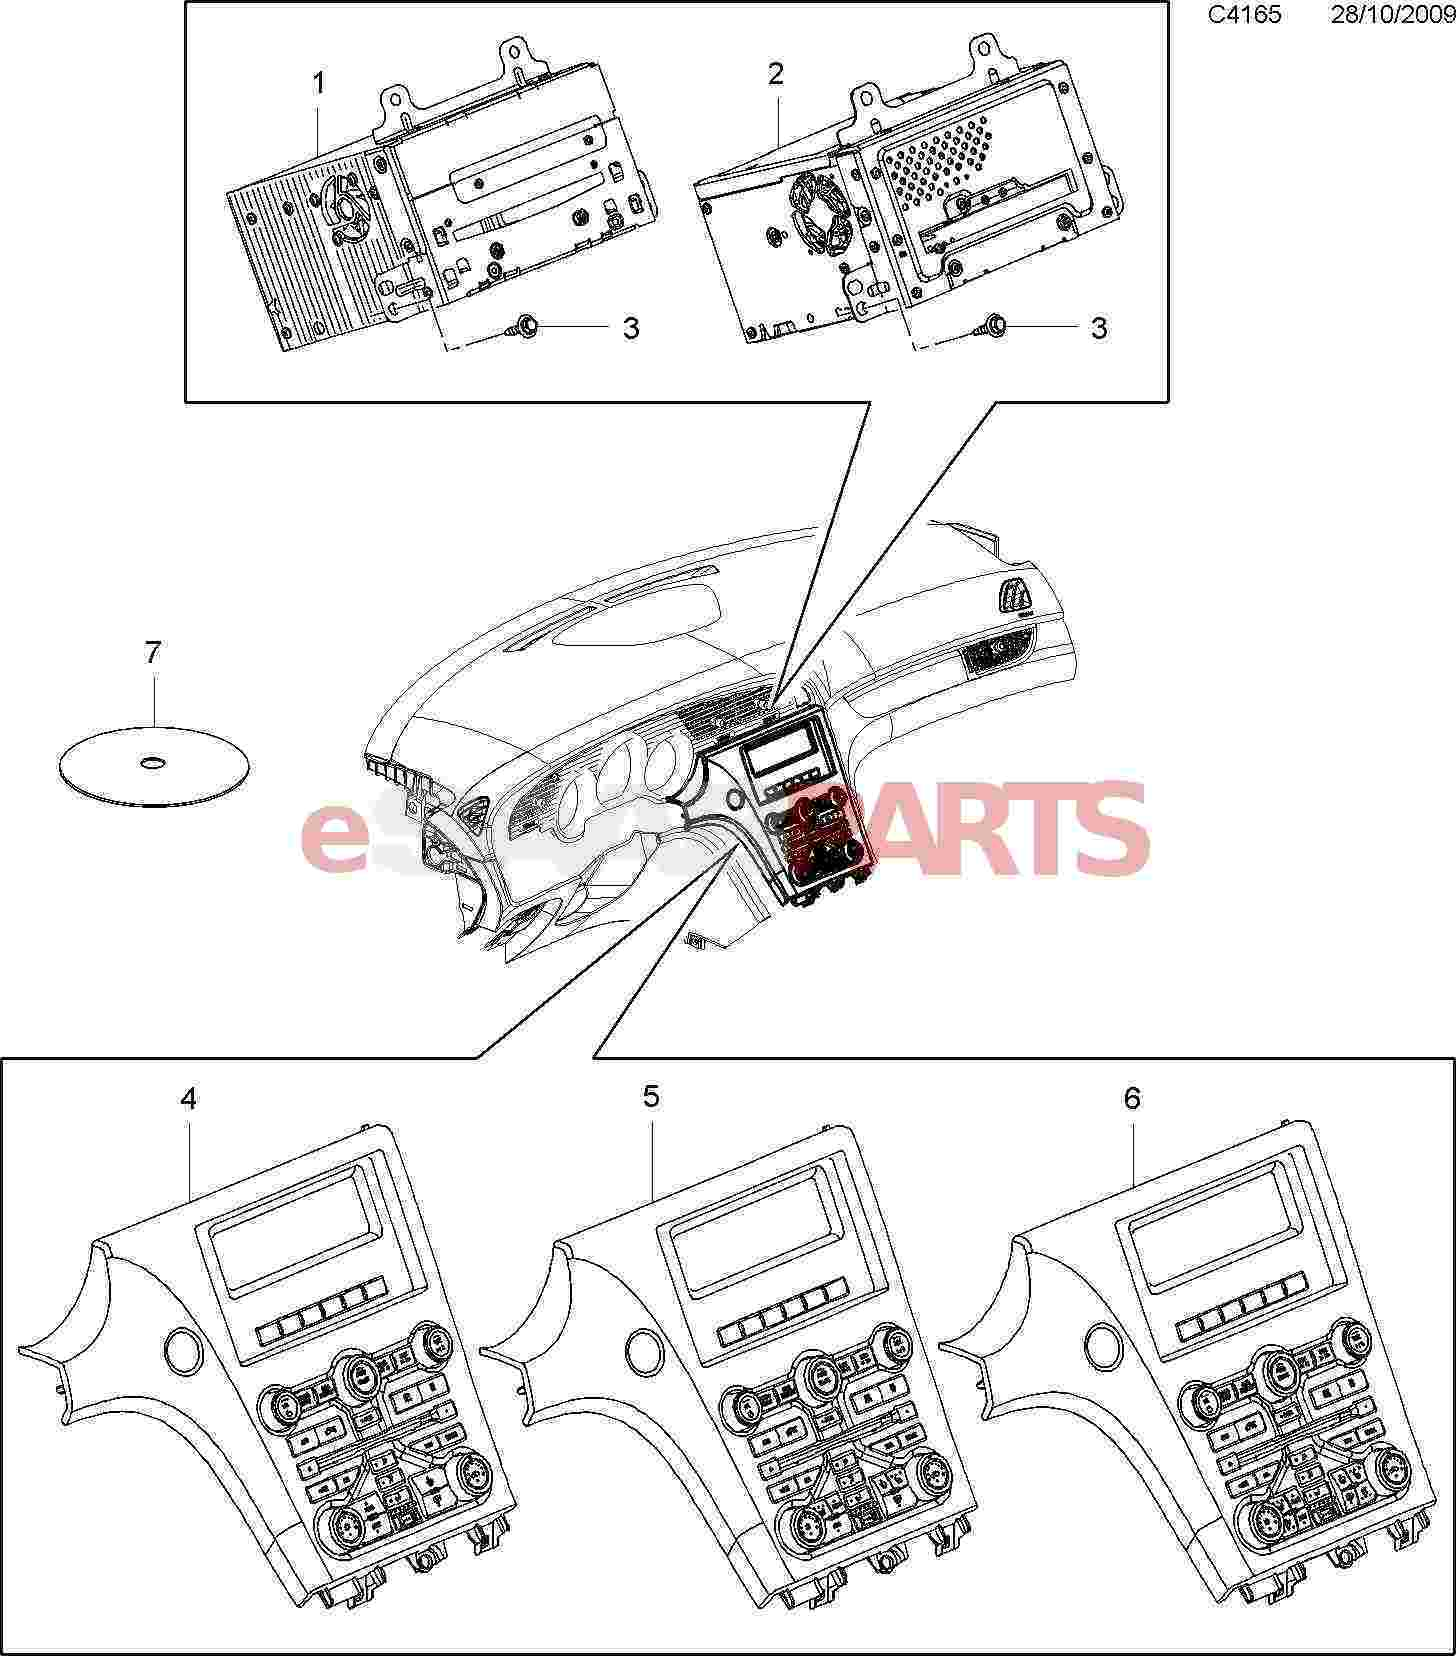 13331338] saab control panel genuine saab parts from esaabparts com13331338 Saab Control Panel Genuine Saab Parts From Esaabpartscom #1